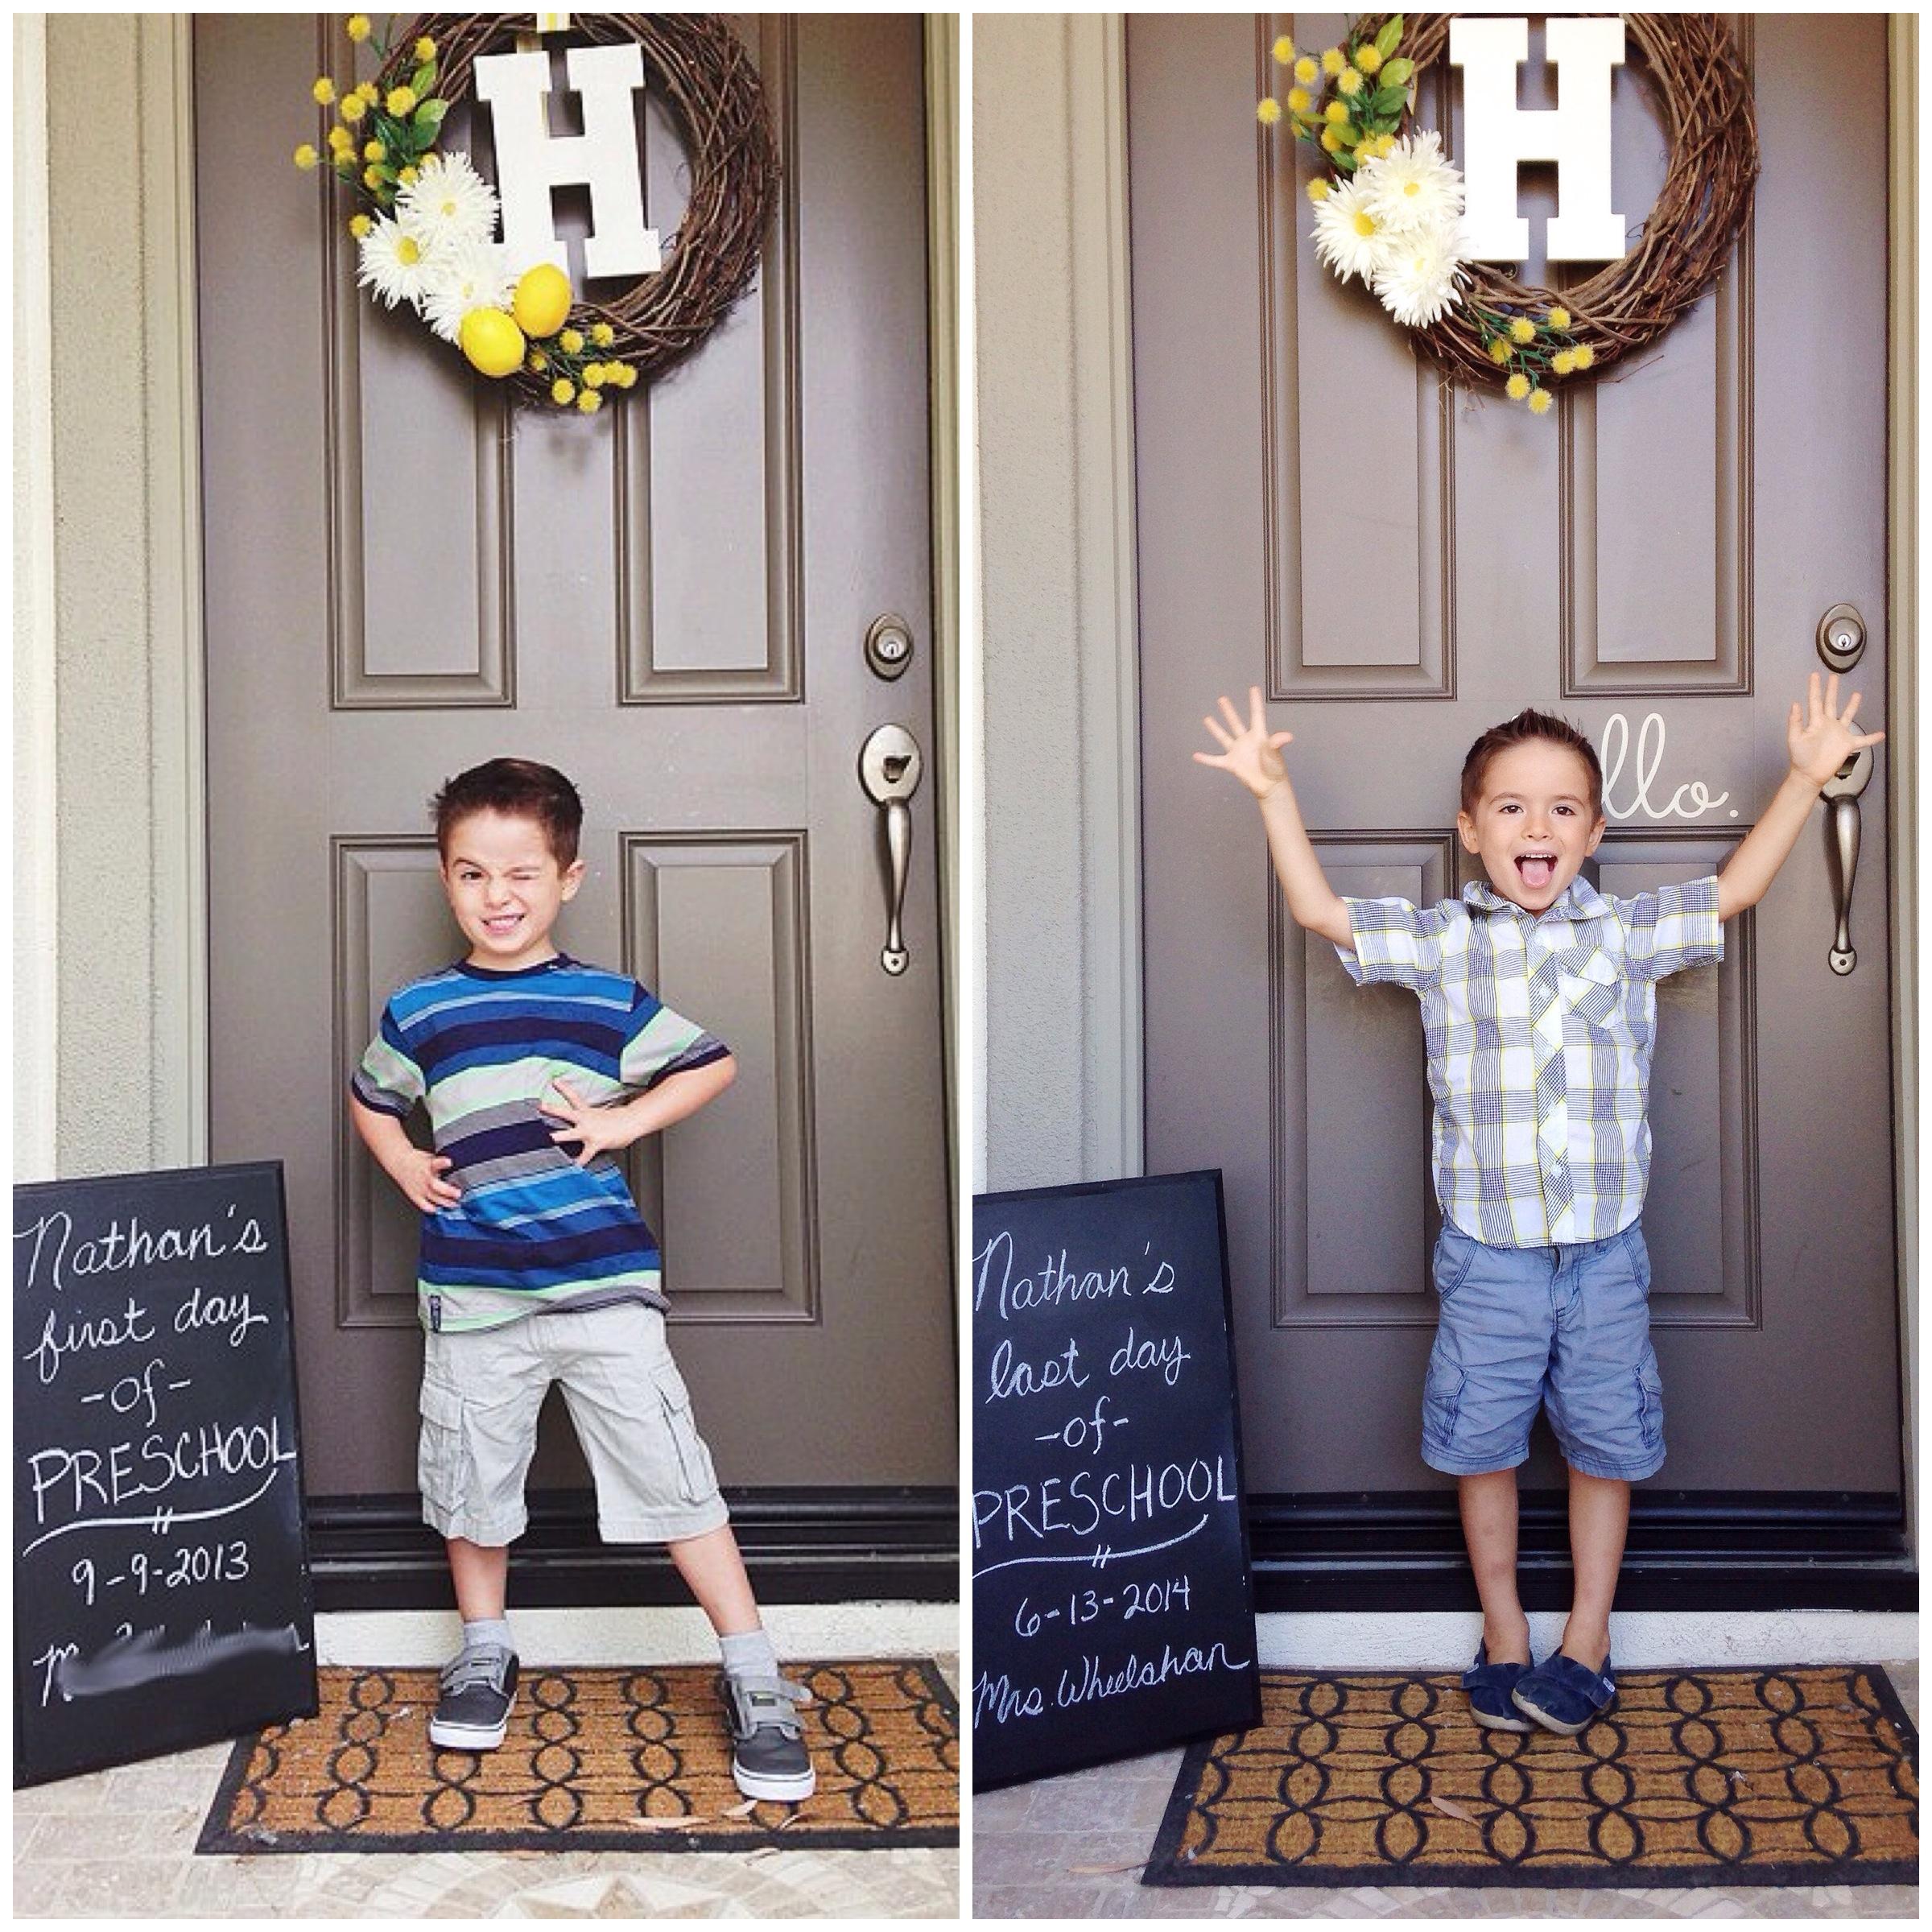 Nathan 2014 preschool